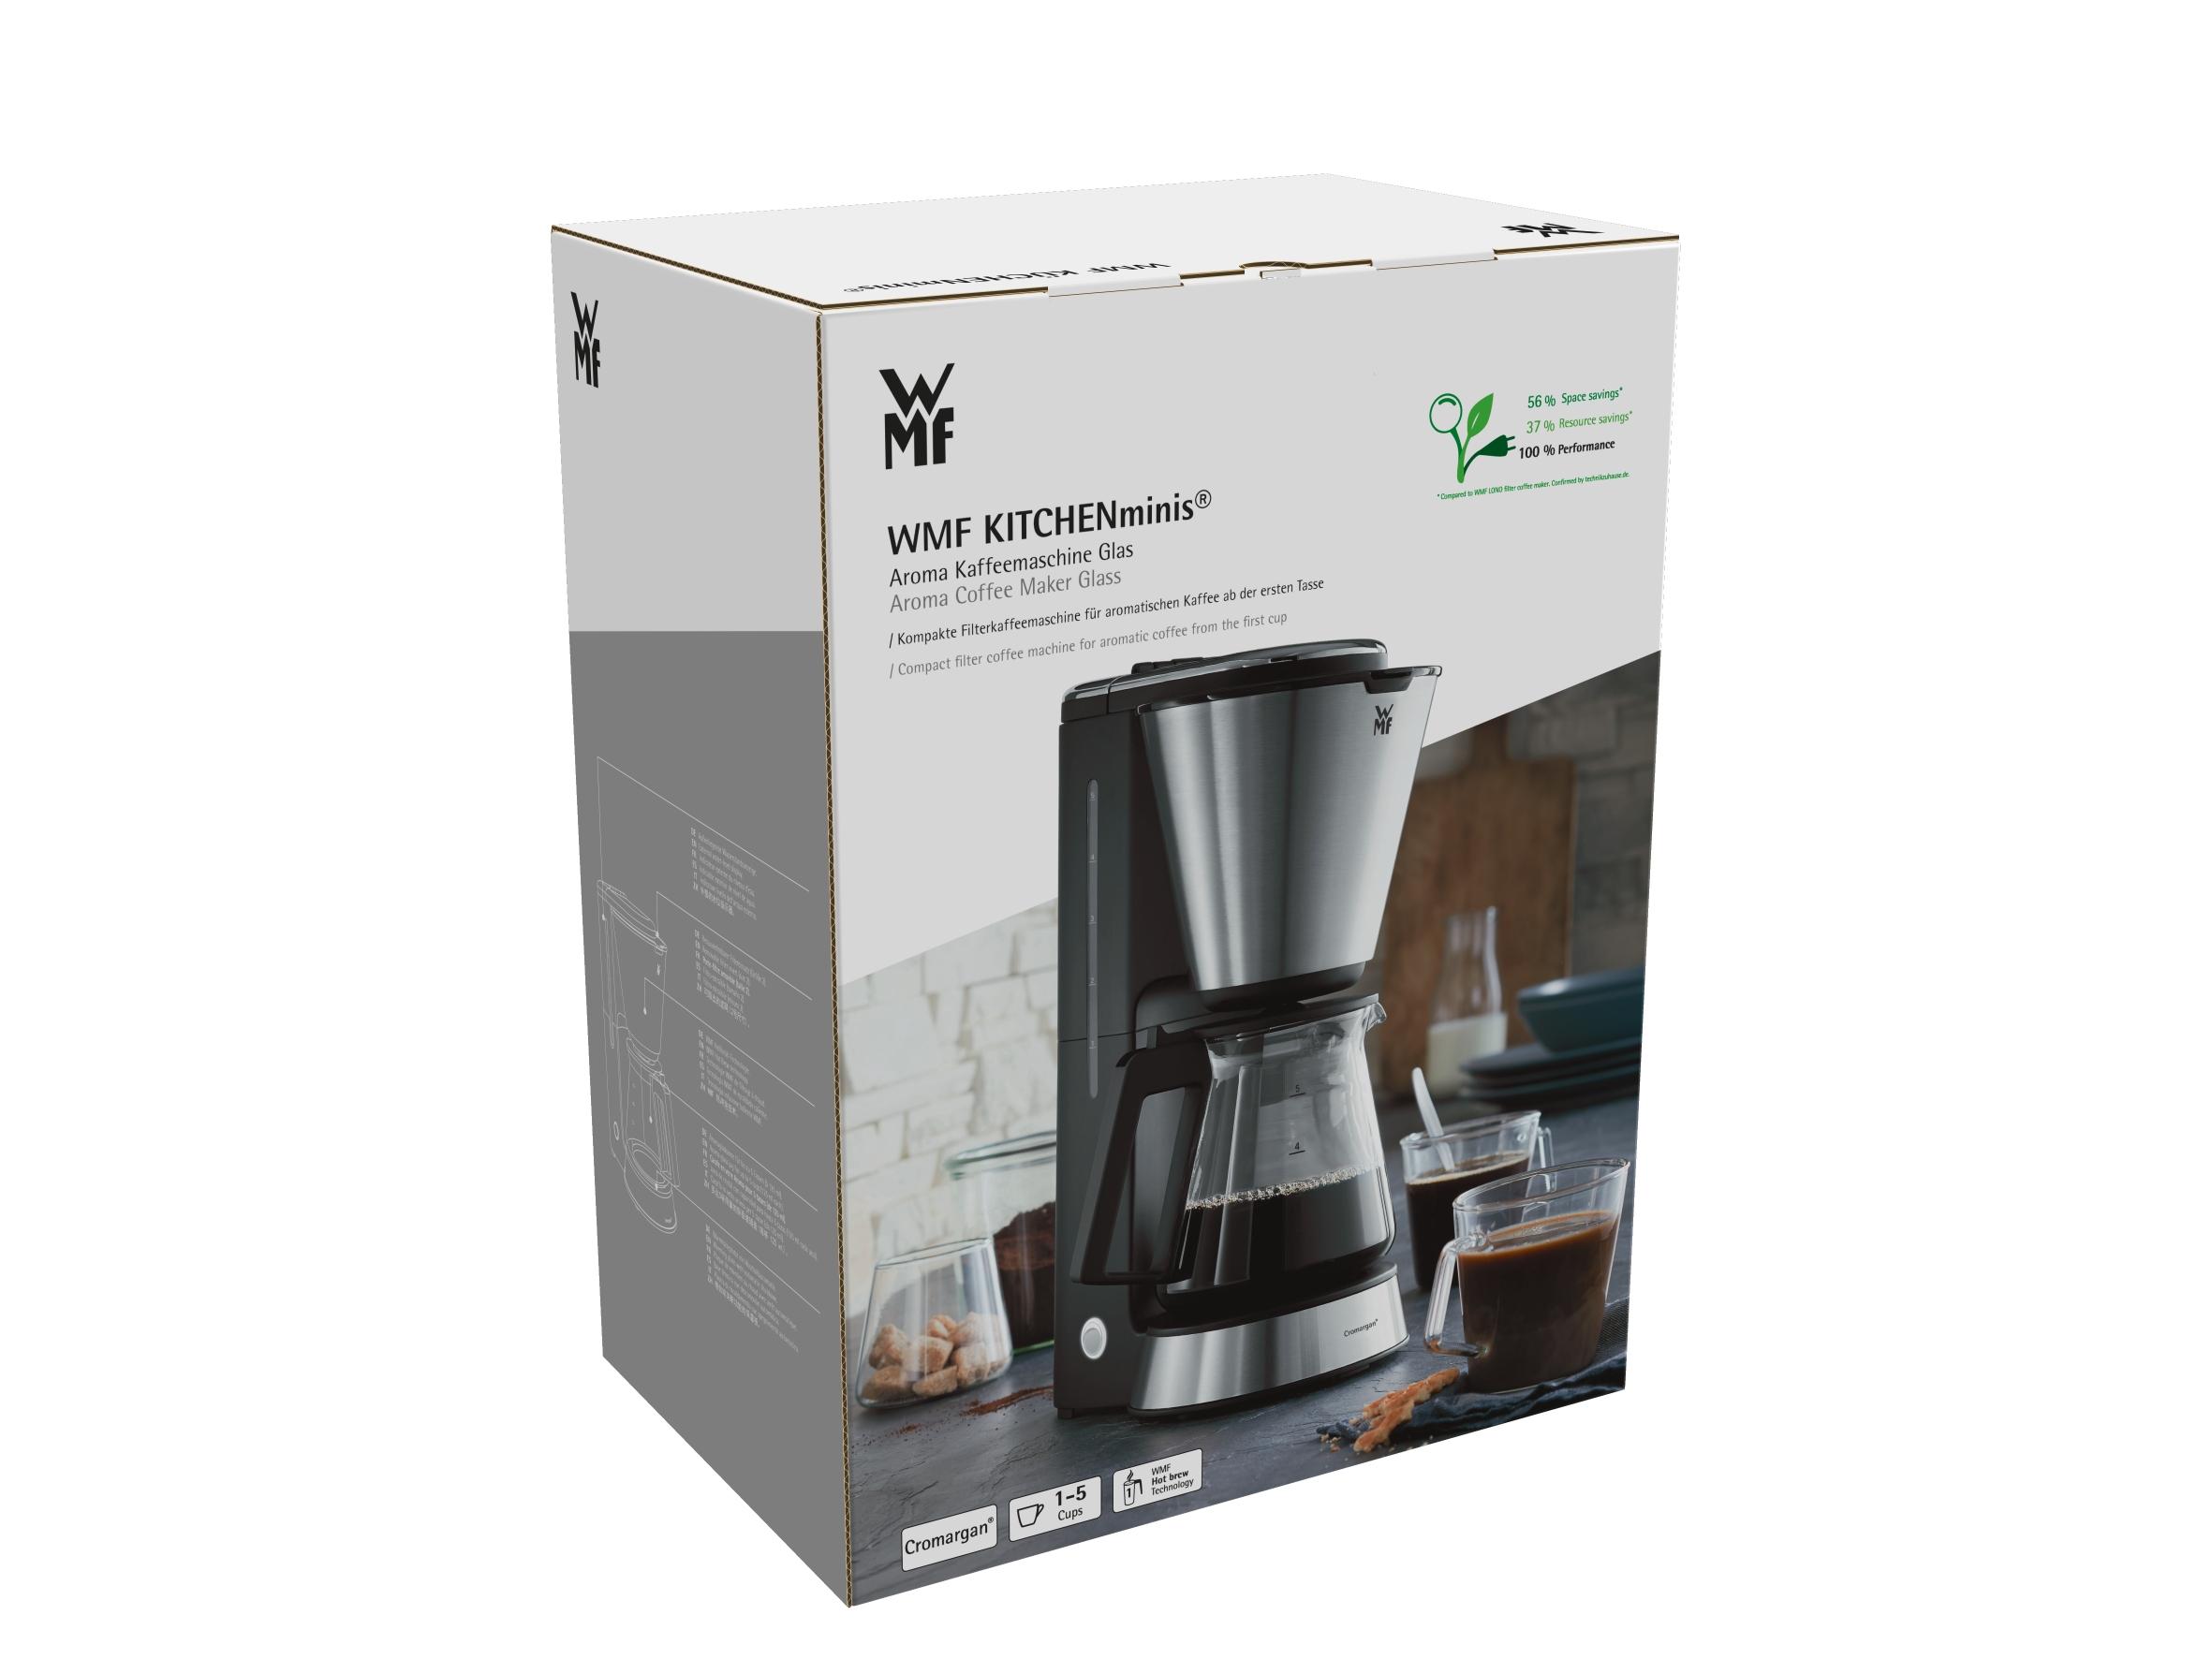 WMF KITCHENminisⓇ Filtre Kahve Makinesi - Cam Karaf